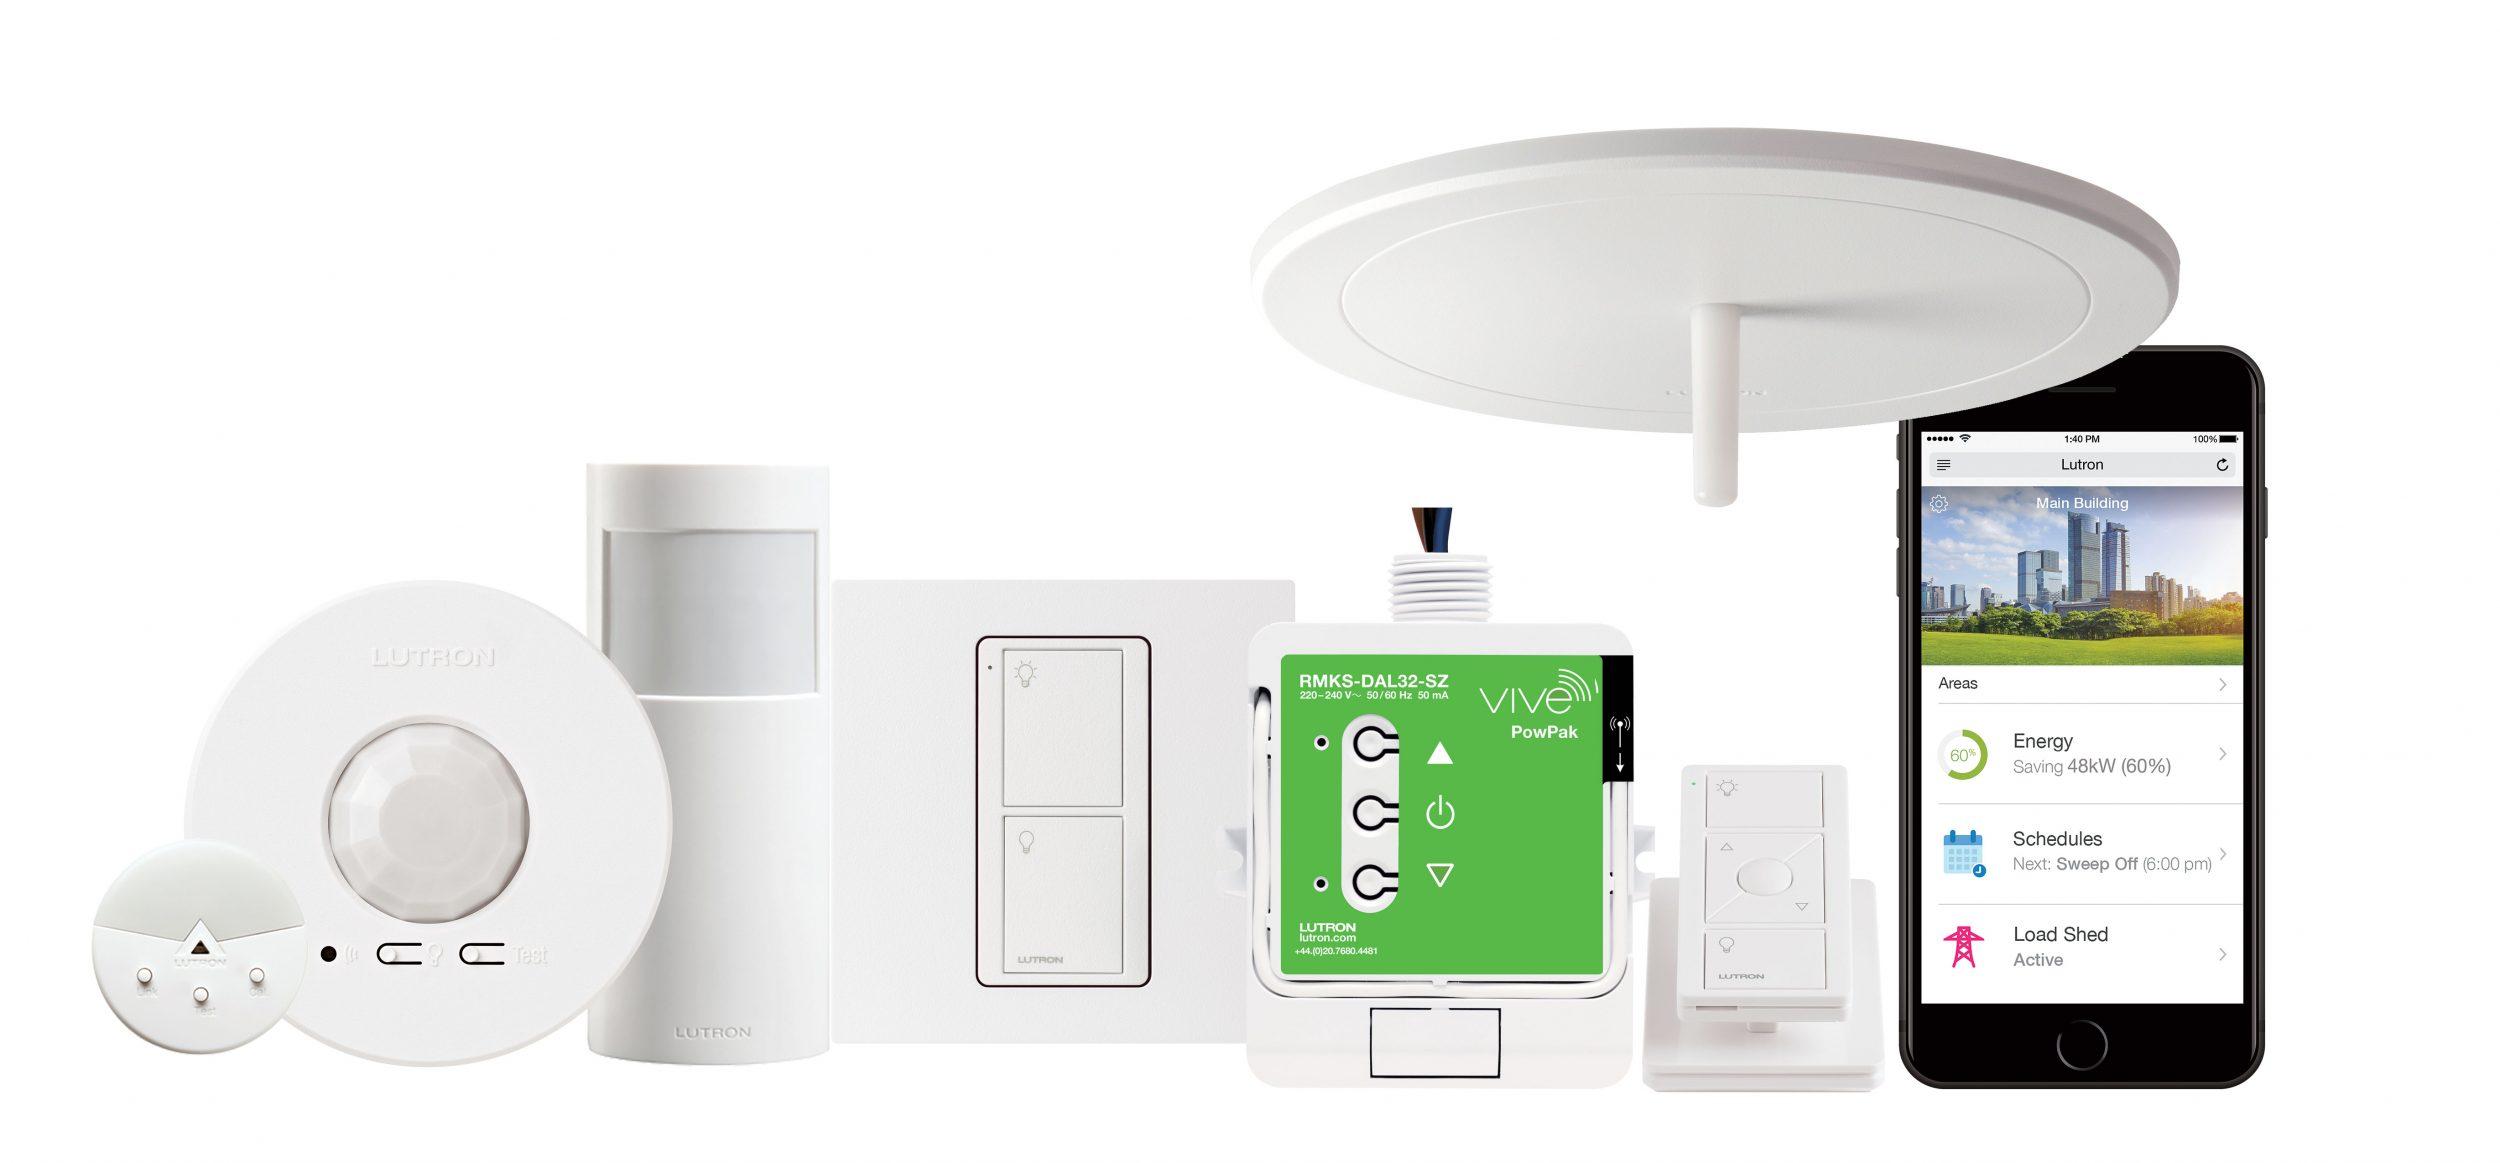 lutron launches vive wireless lighting